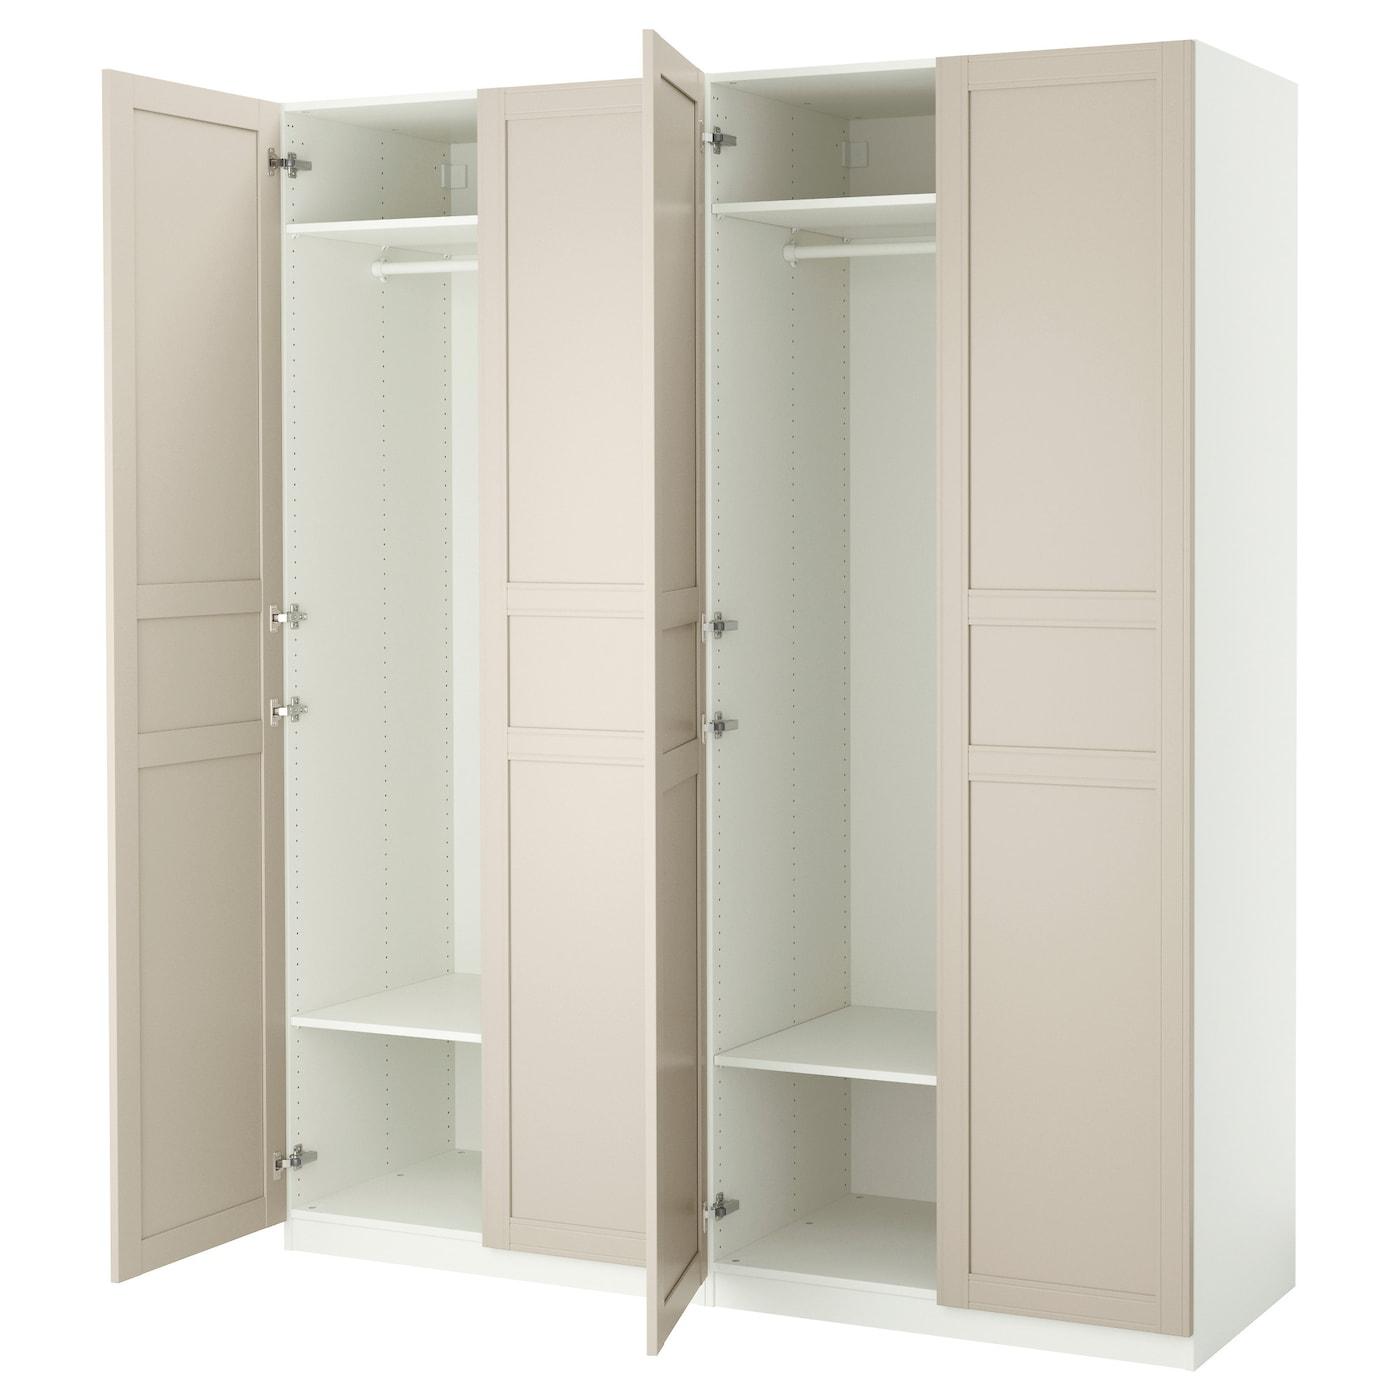 Pax armario blanco flisberget beige claro 200 x 60 x 236 cm ikea - Ikea armarios modulares ...